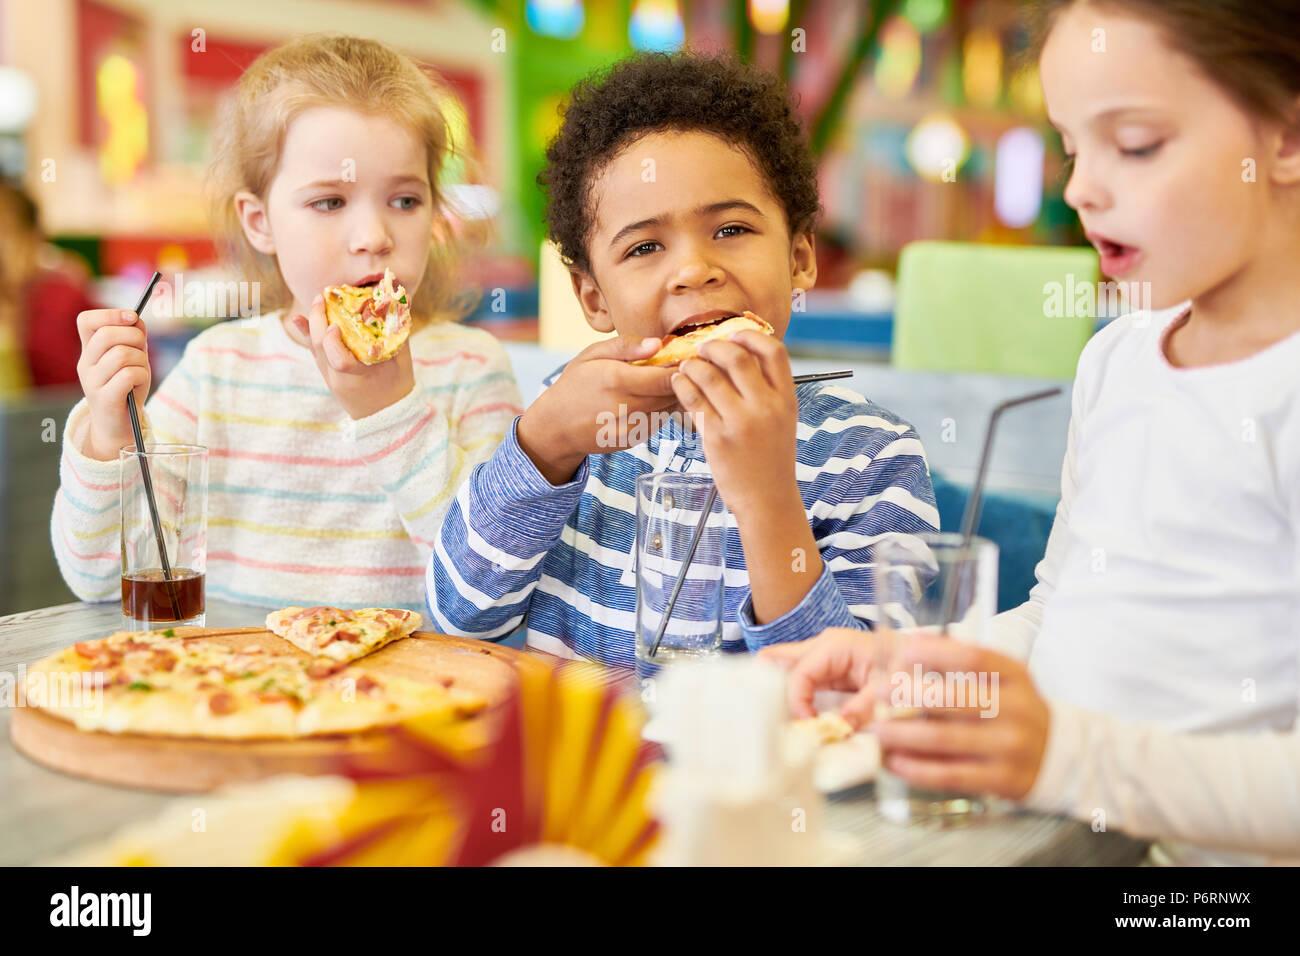 Children in Pizzeria Cafe - Stock Image